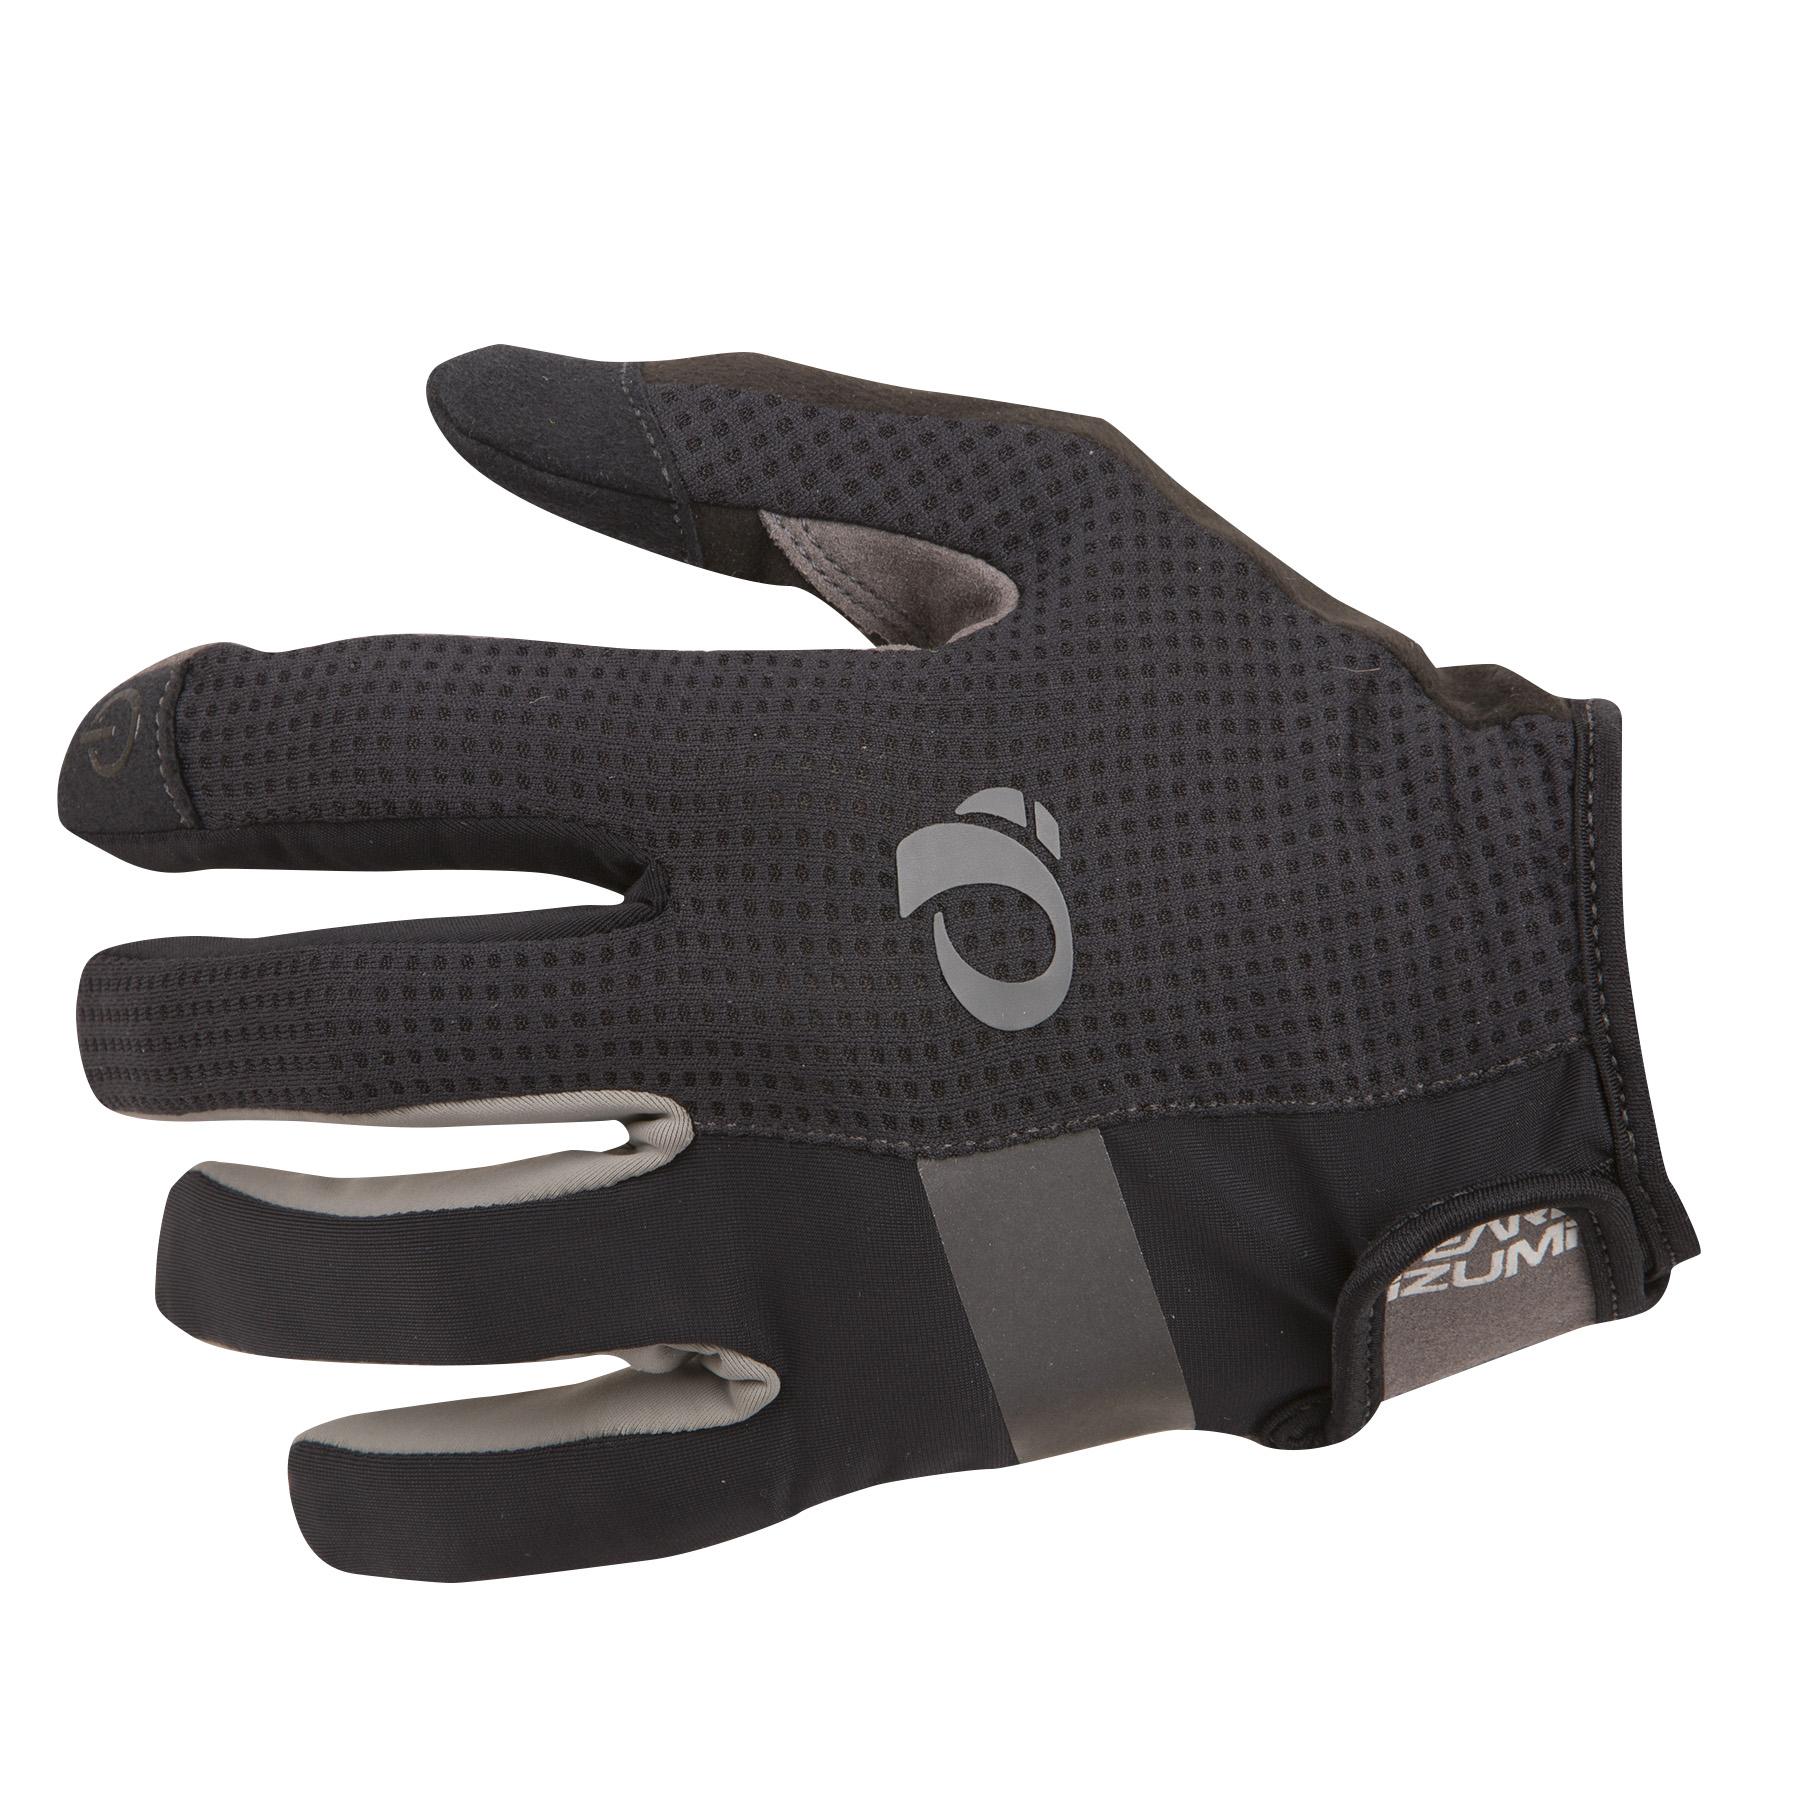 Pearl Izumi Elite Gel Full Finger Bike Cycling Gloves Black 2XL